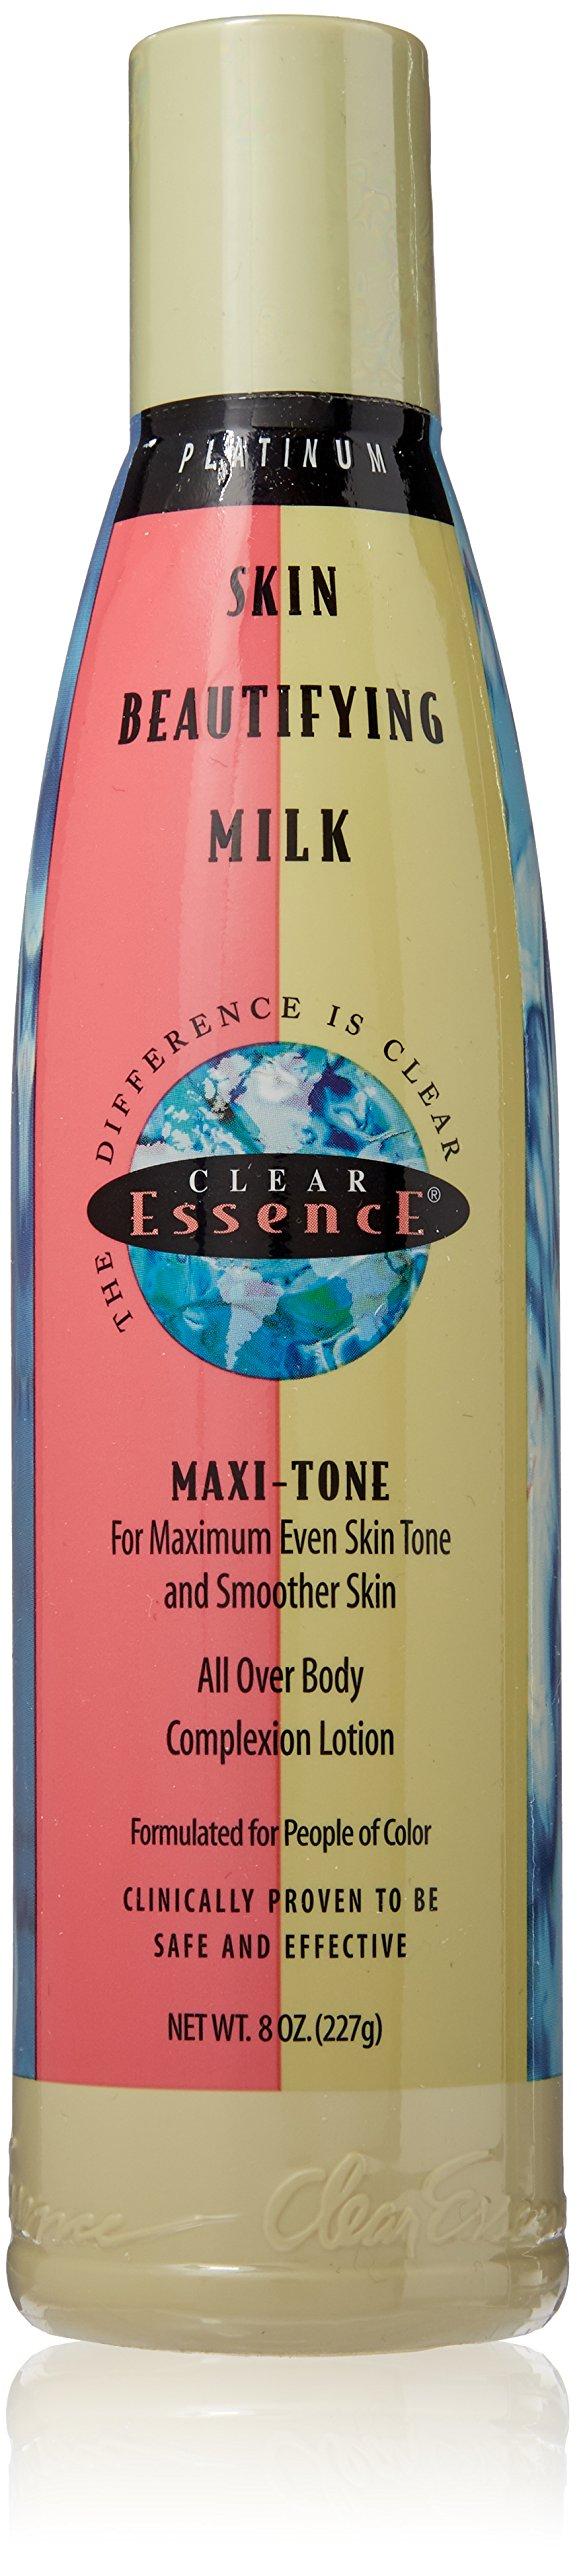 Clear Essence Platinum Line Skin Beautifying Milk, 8 Ounce